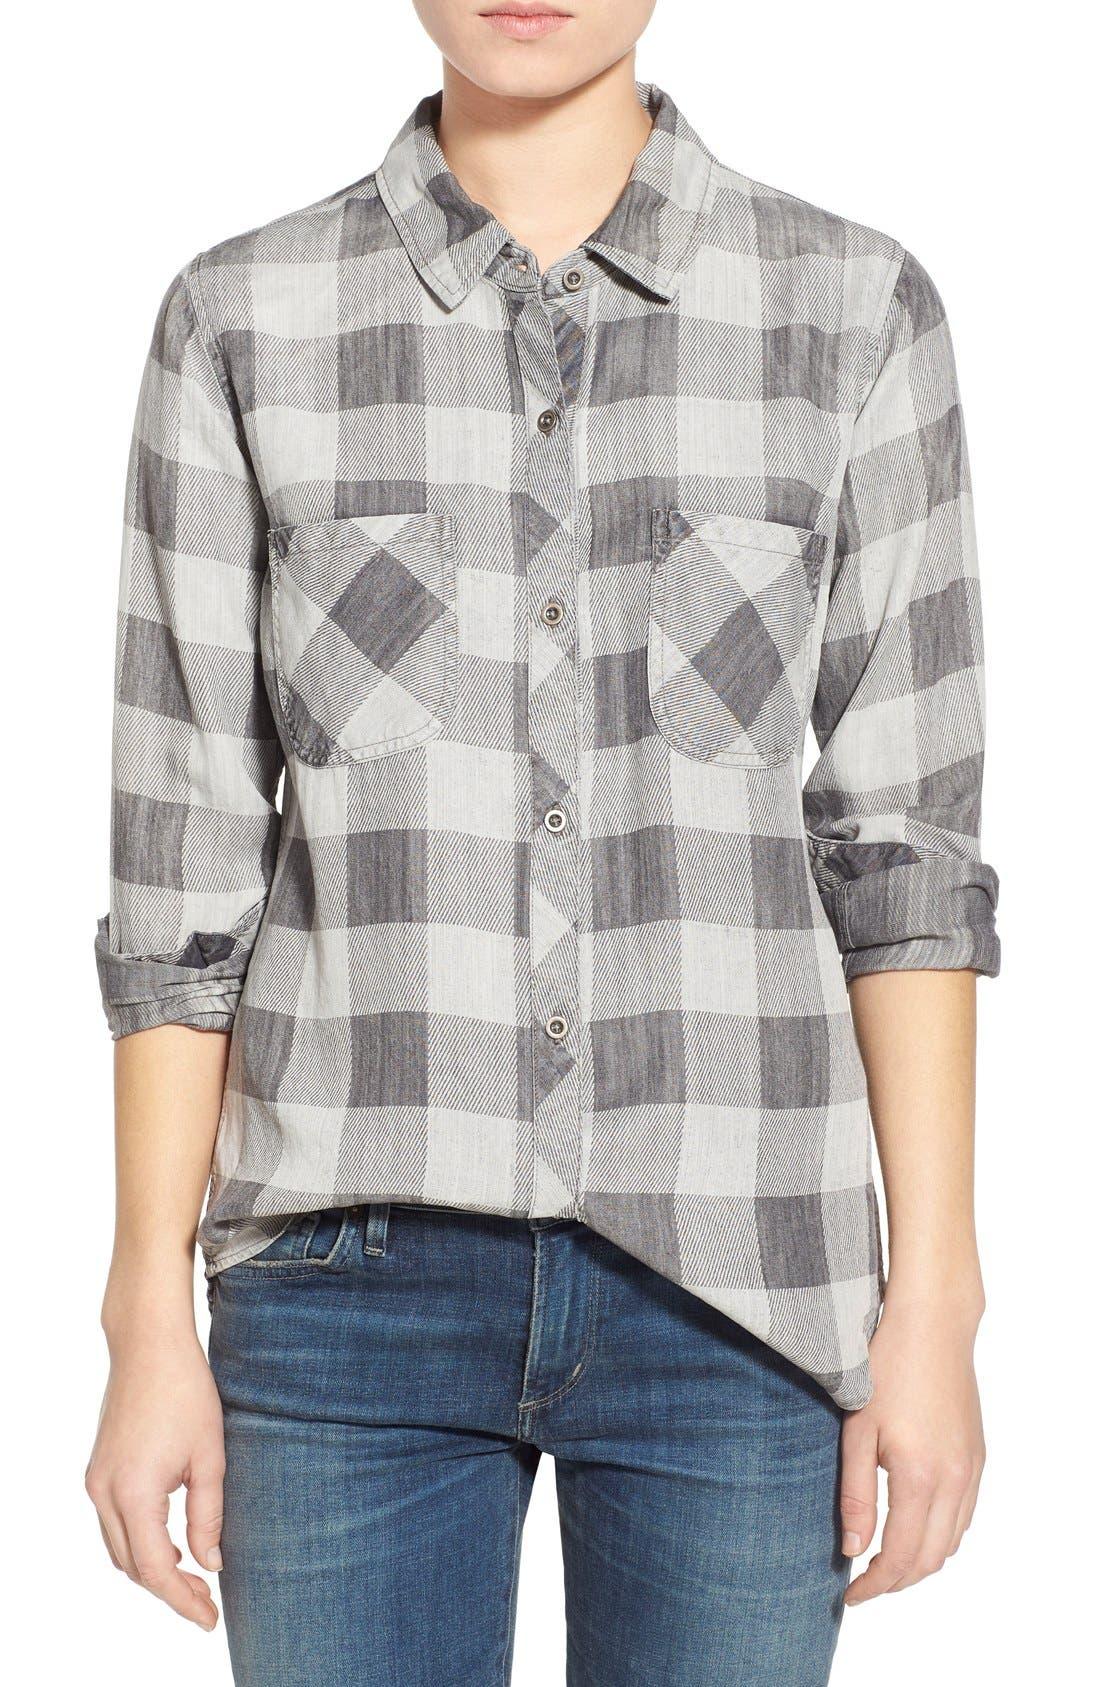 Alternate Image 1 Selected - Rails 'Carter' Buffalo Check Shirt